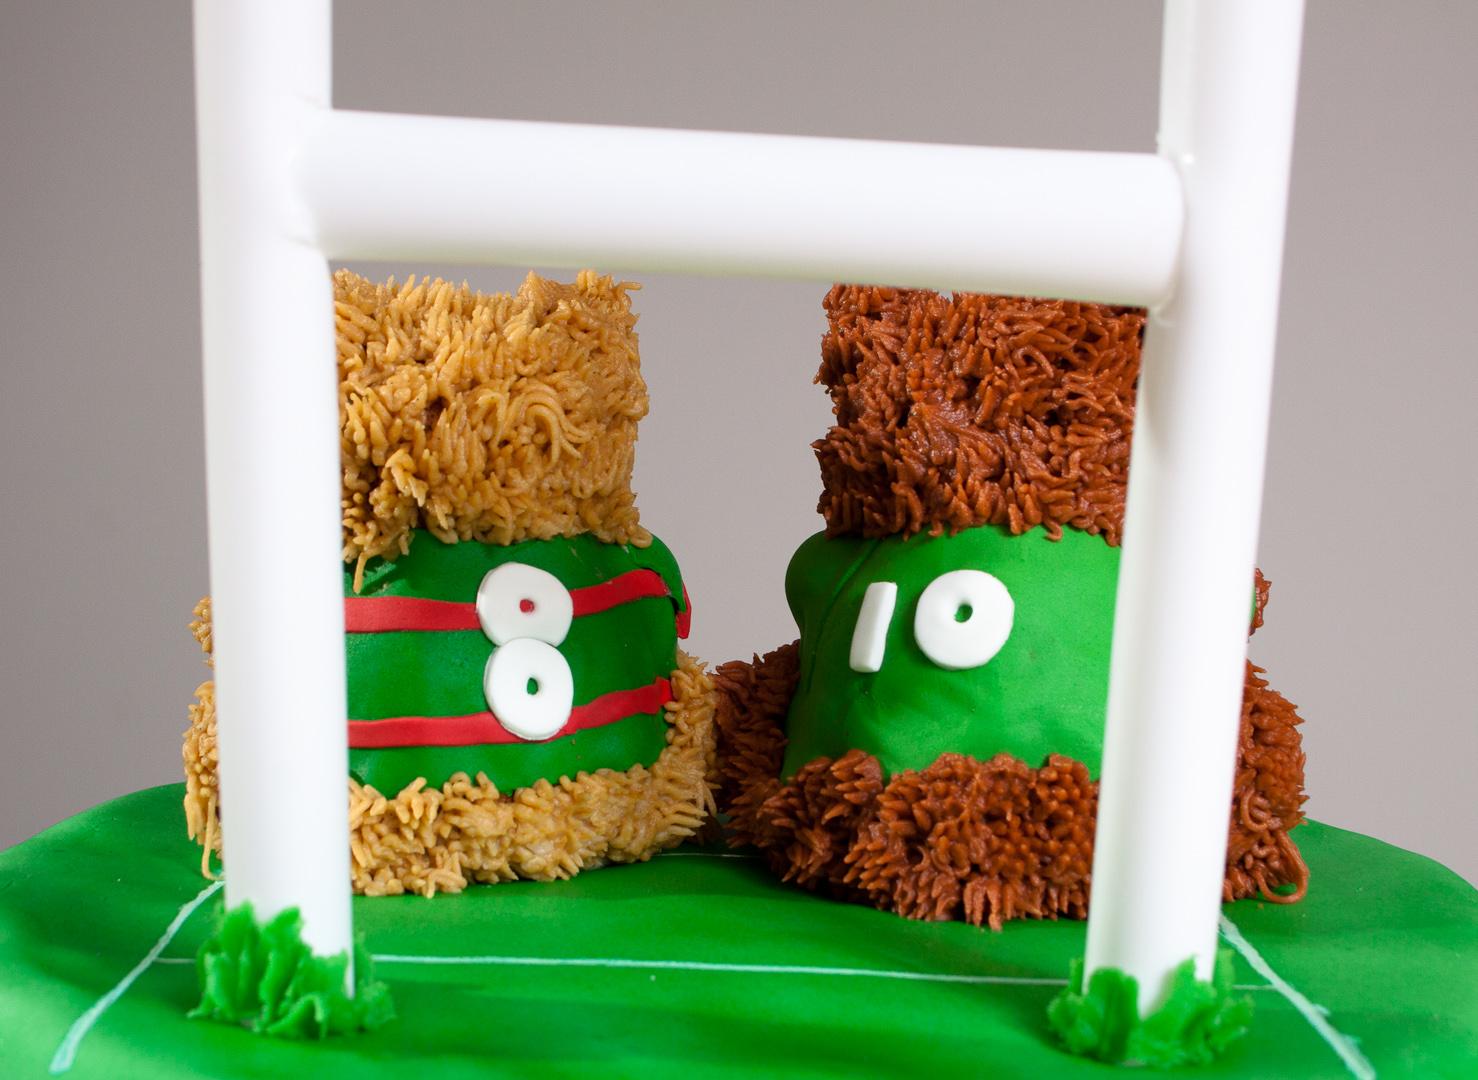 Footy Cakes Sydney